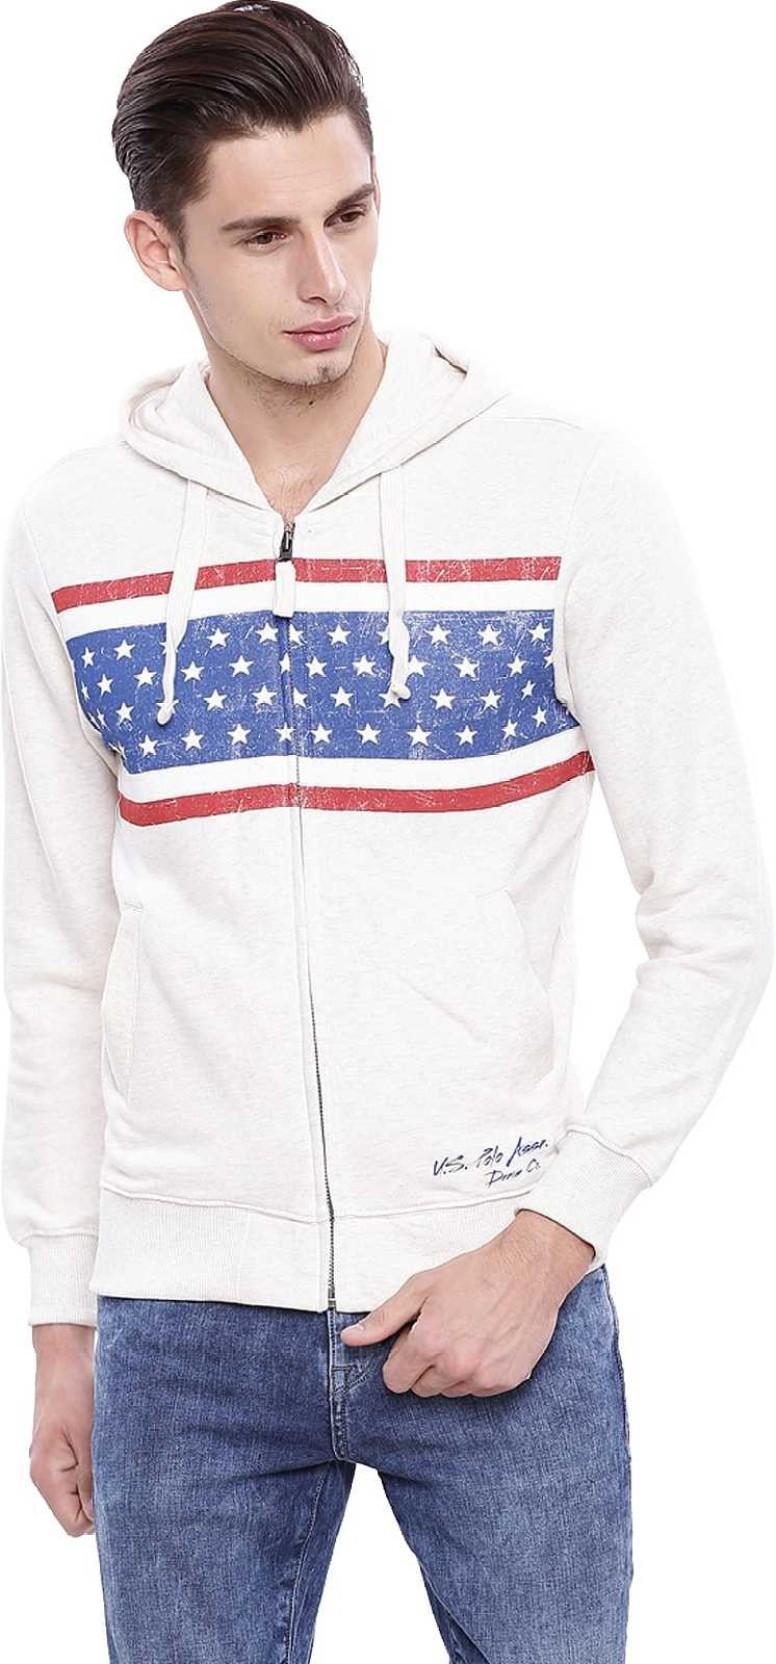 fb404f1e U.S. Polo Assn Full Sleeve Striped Men Sweatshirt - Buy Ivory ...